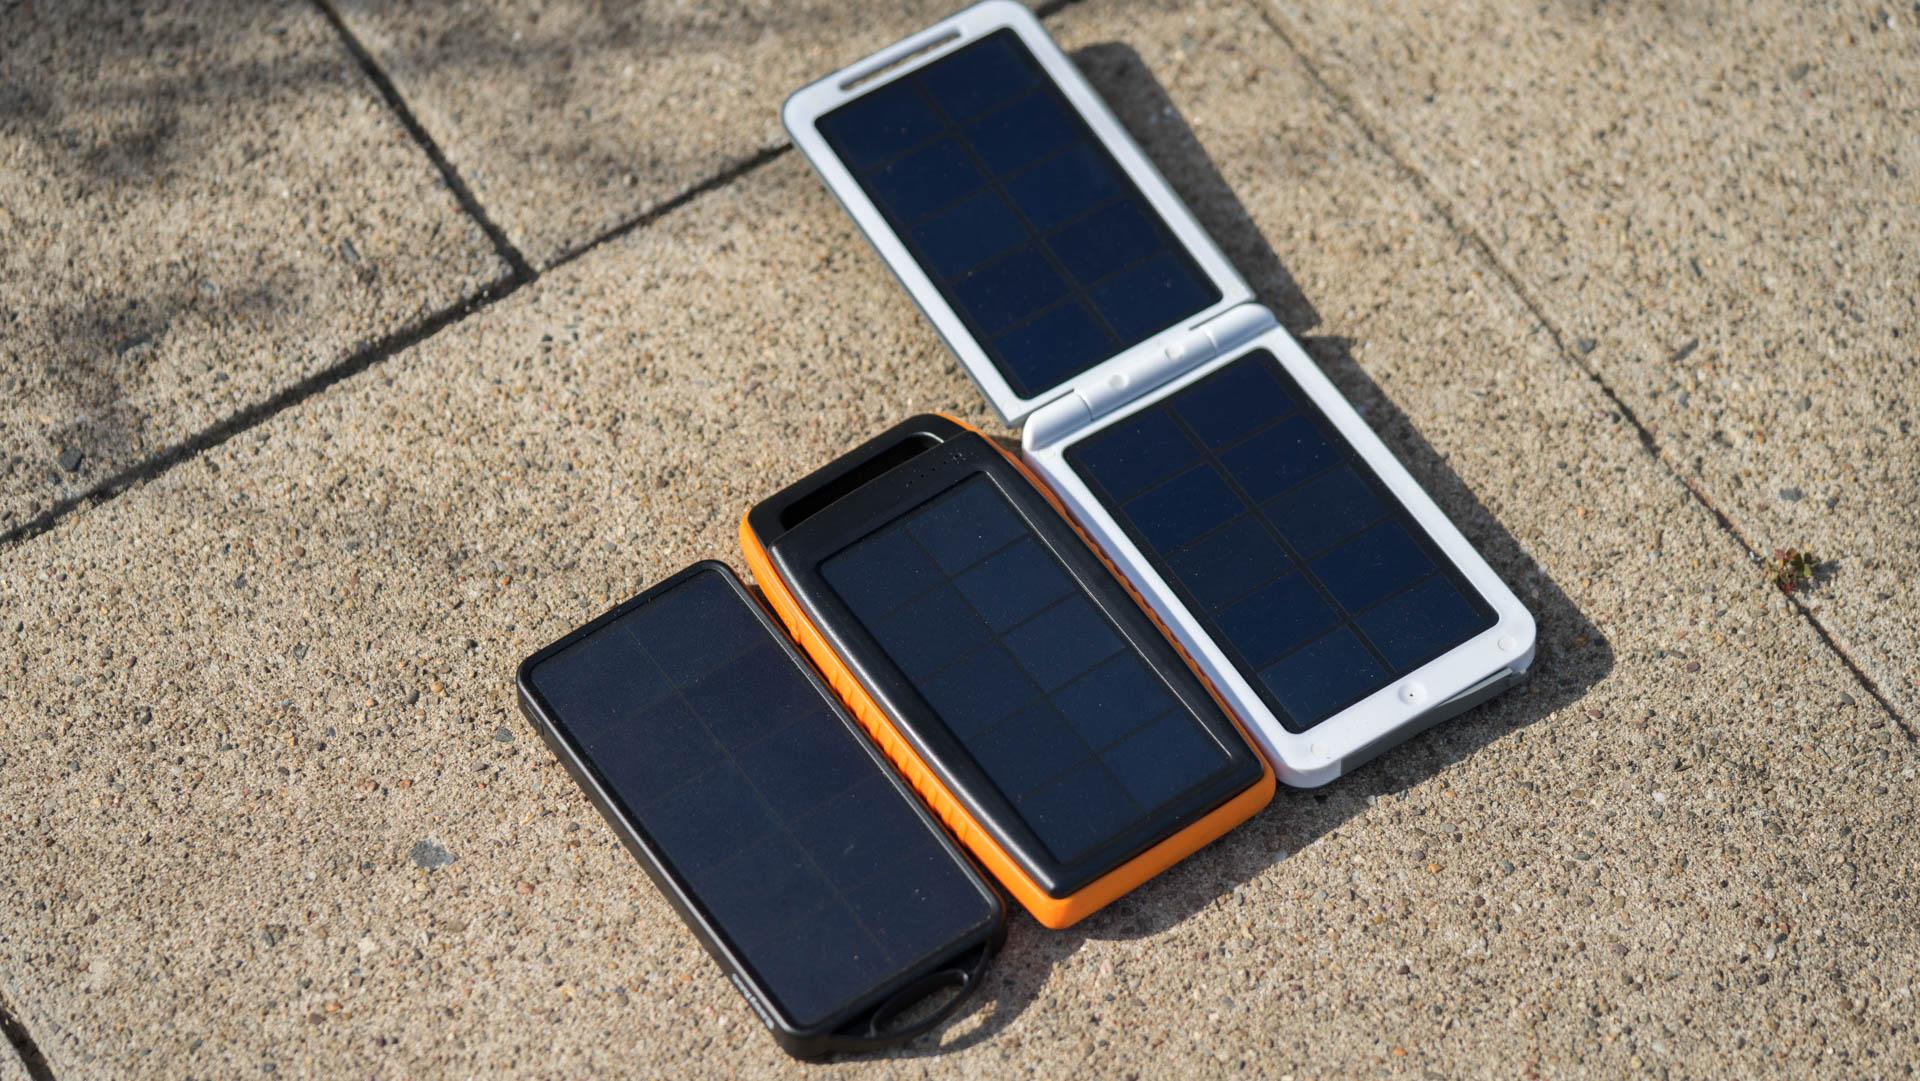 die ravpower rp pb003 15000mah solar powerbank im test. Black Bedroom Furniture Sets. Home Design Ideas